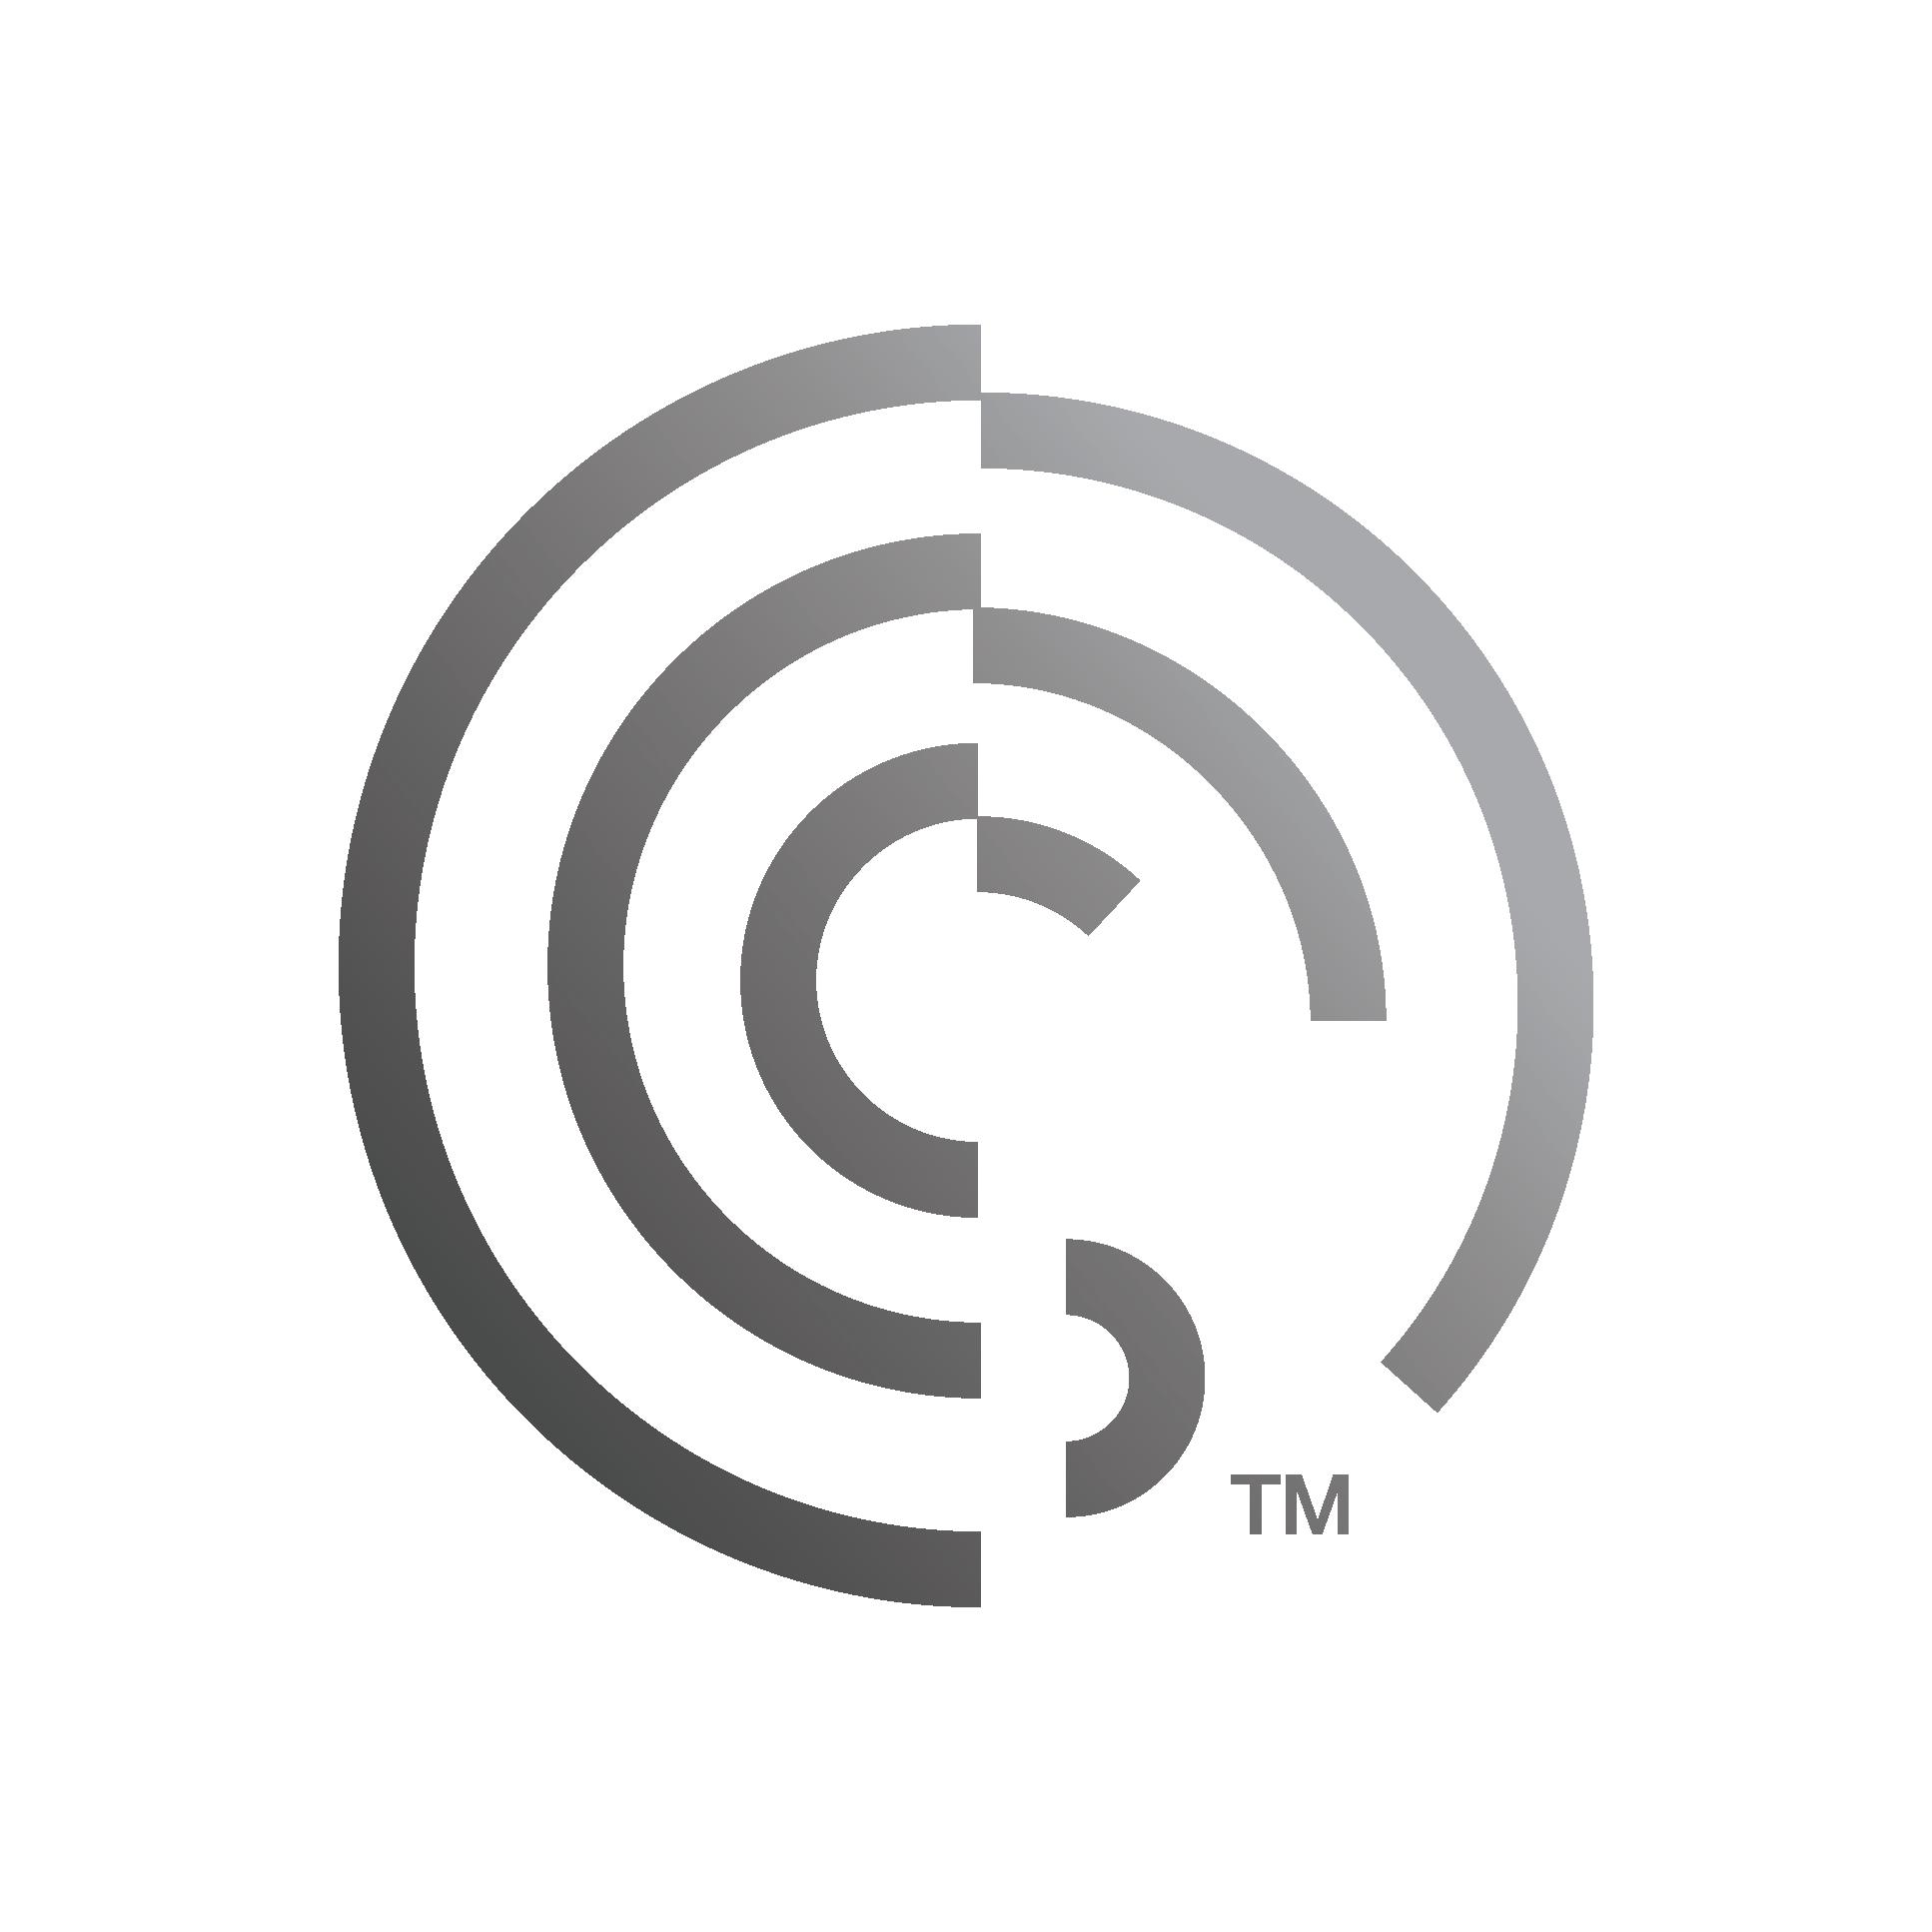 CMS_Logo_2017_23-15.png